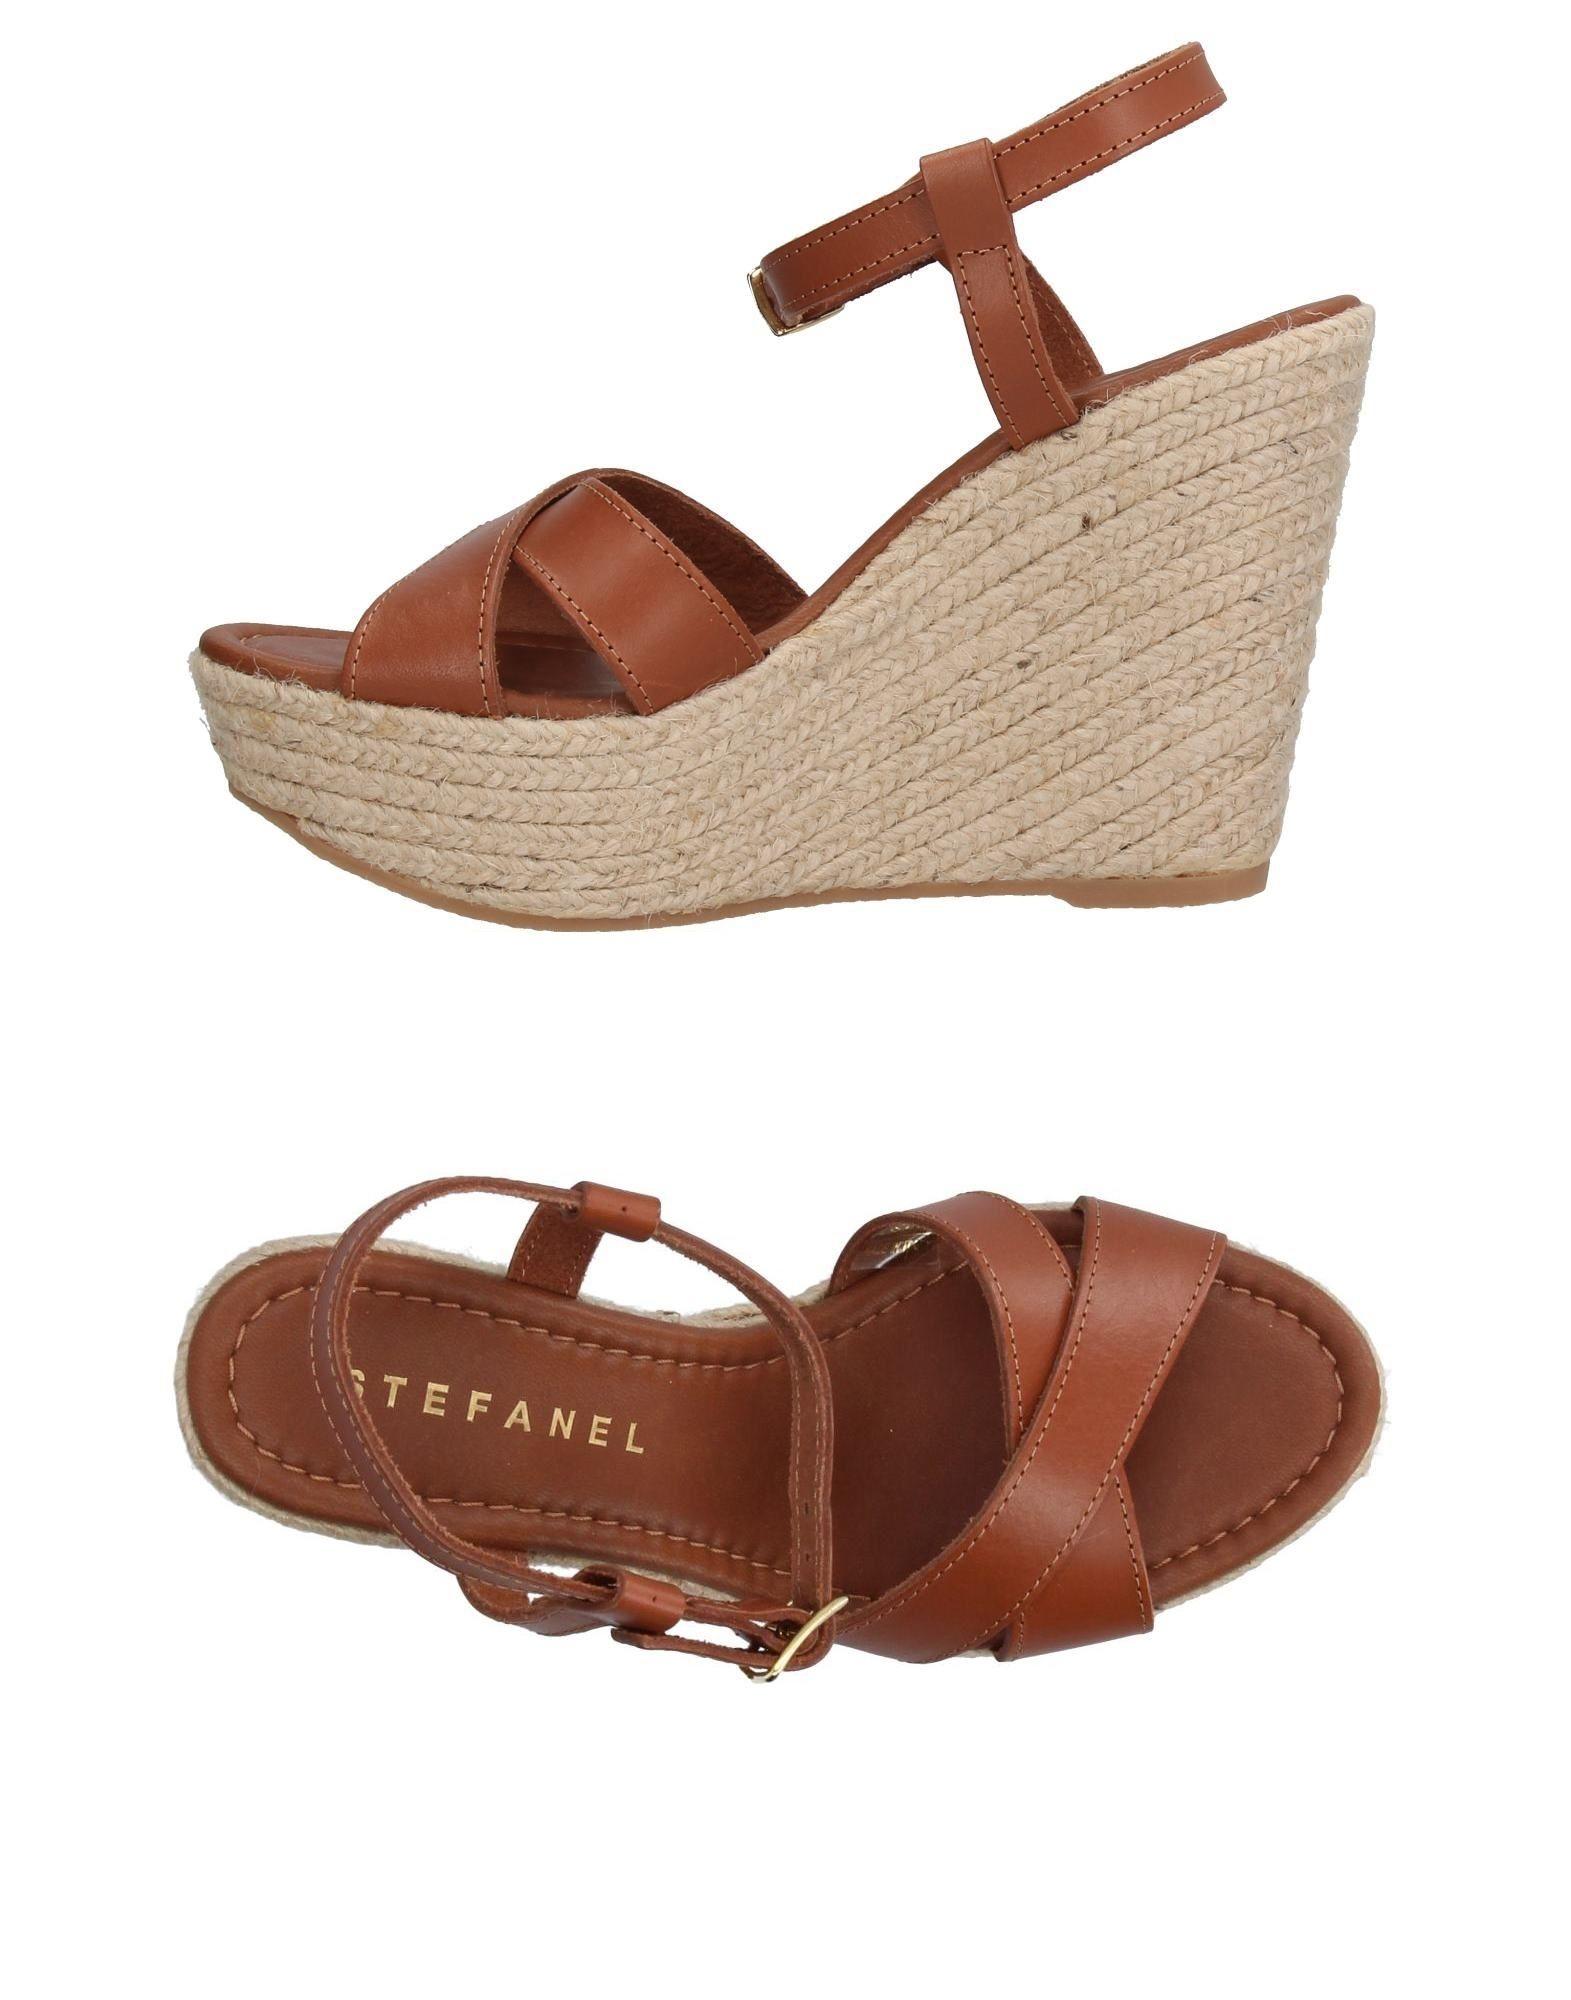 Stefanel Espadrilles Damen  11210032BT Gute Qualität beliebte Schuhe